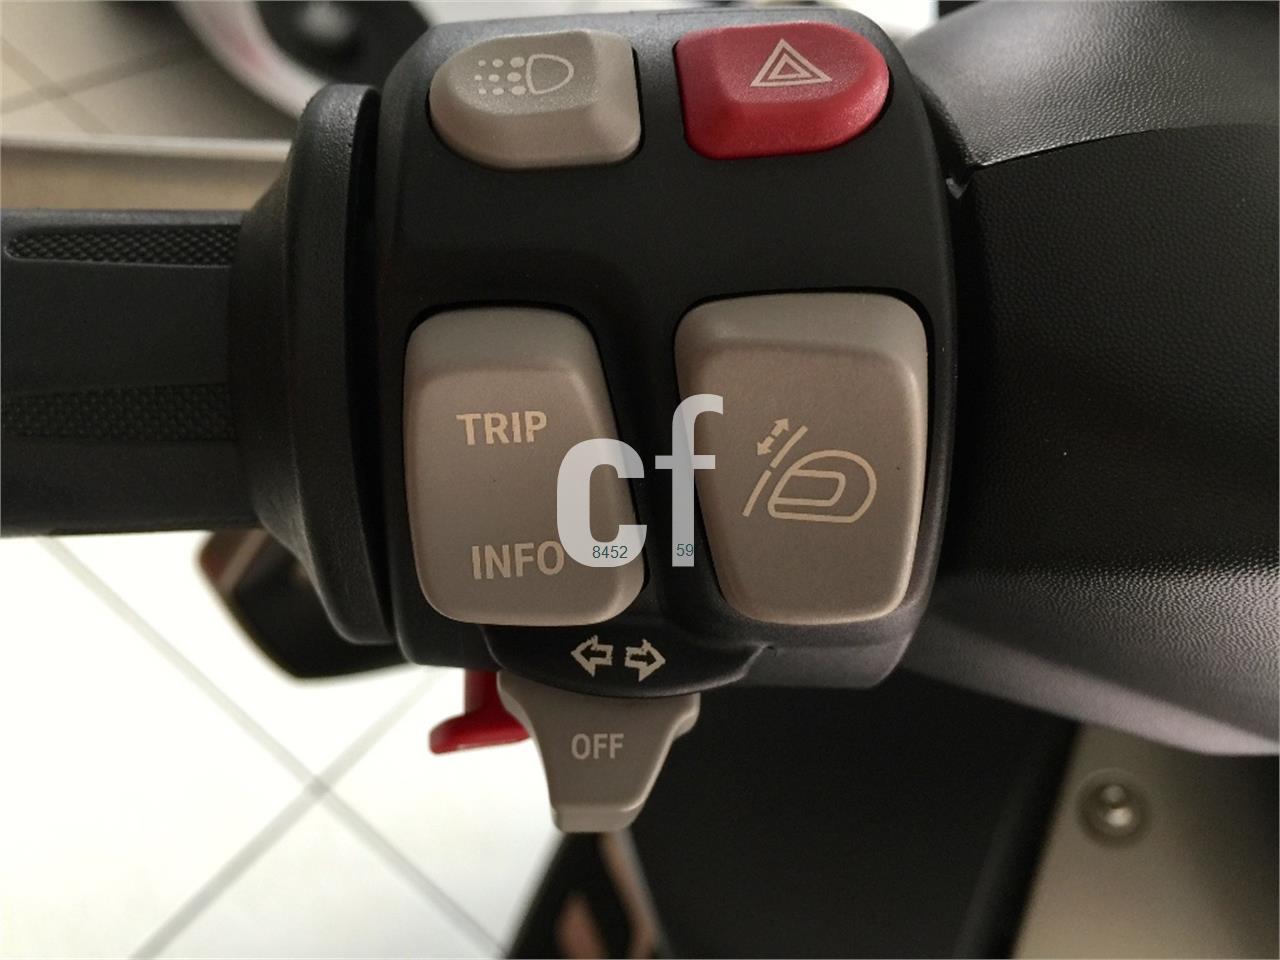 Bmw c 650 gt de moto segunda mano en las palmas 27000 km - Tablet segunda mano las palmas ...